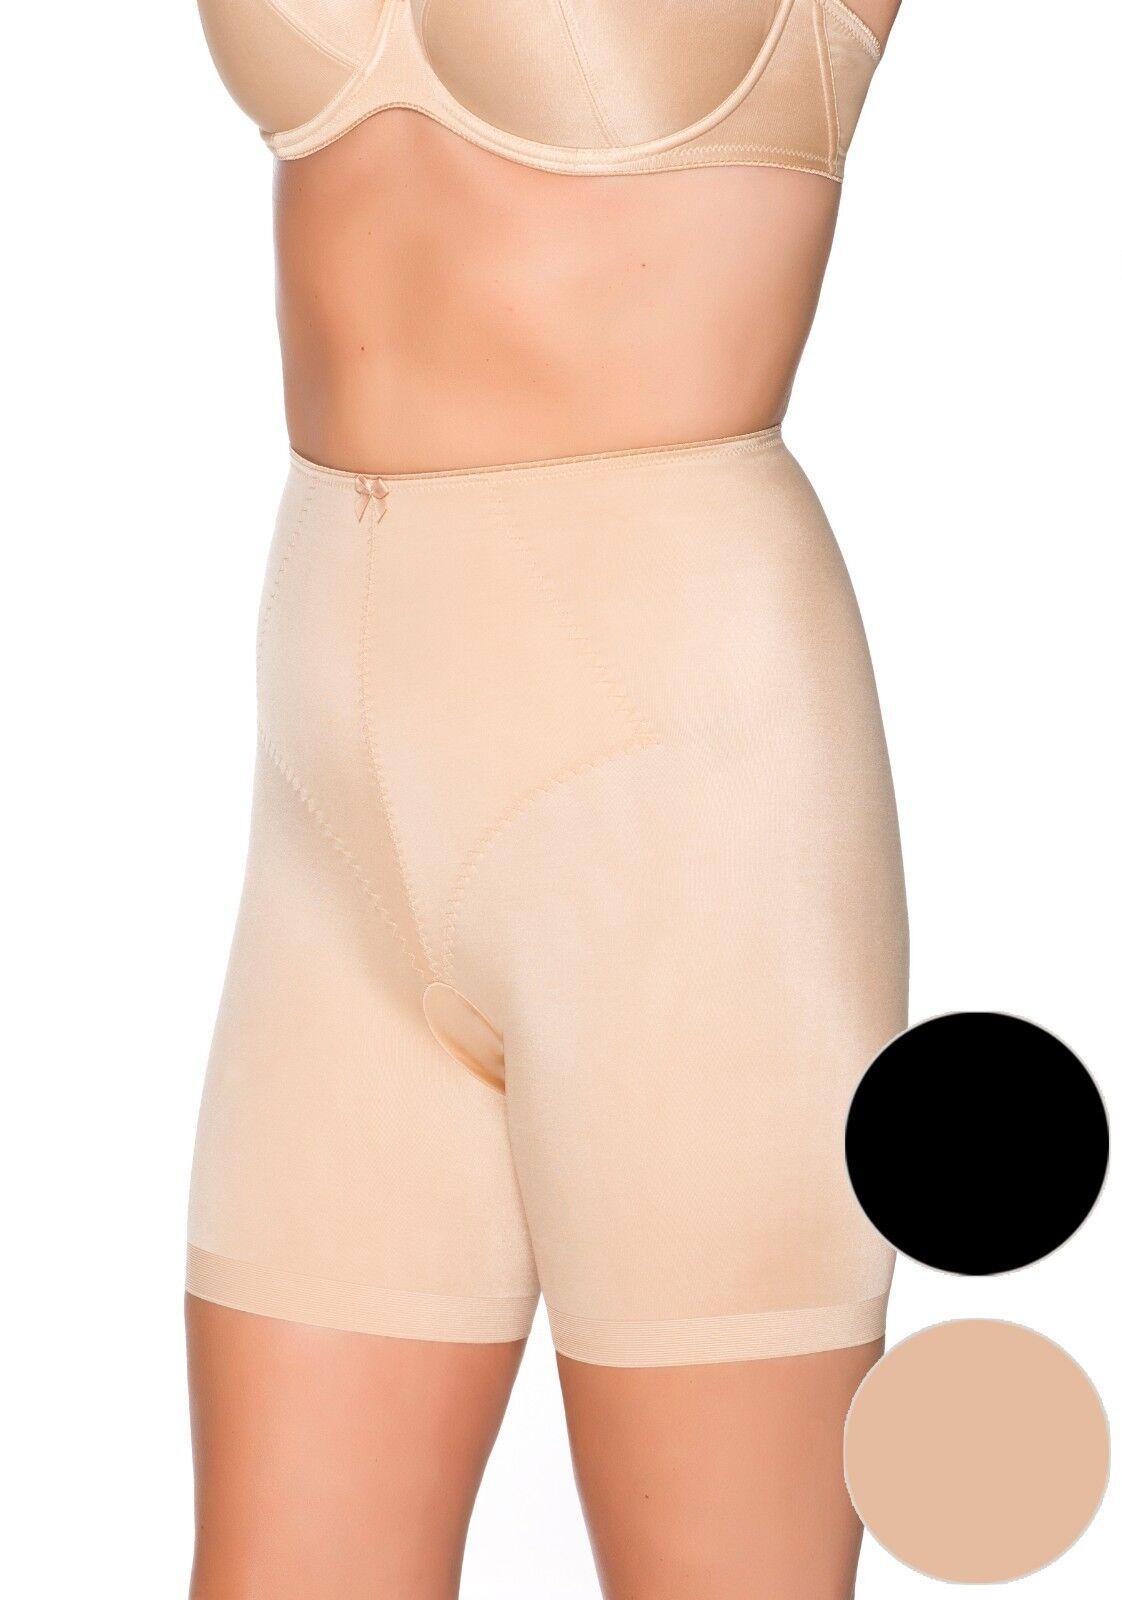 ULLA DESSOUS Miederhose avec jambe Yara peau NUDE Noir Figurine ForHommesd 3718